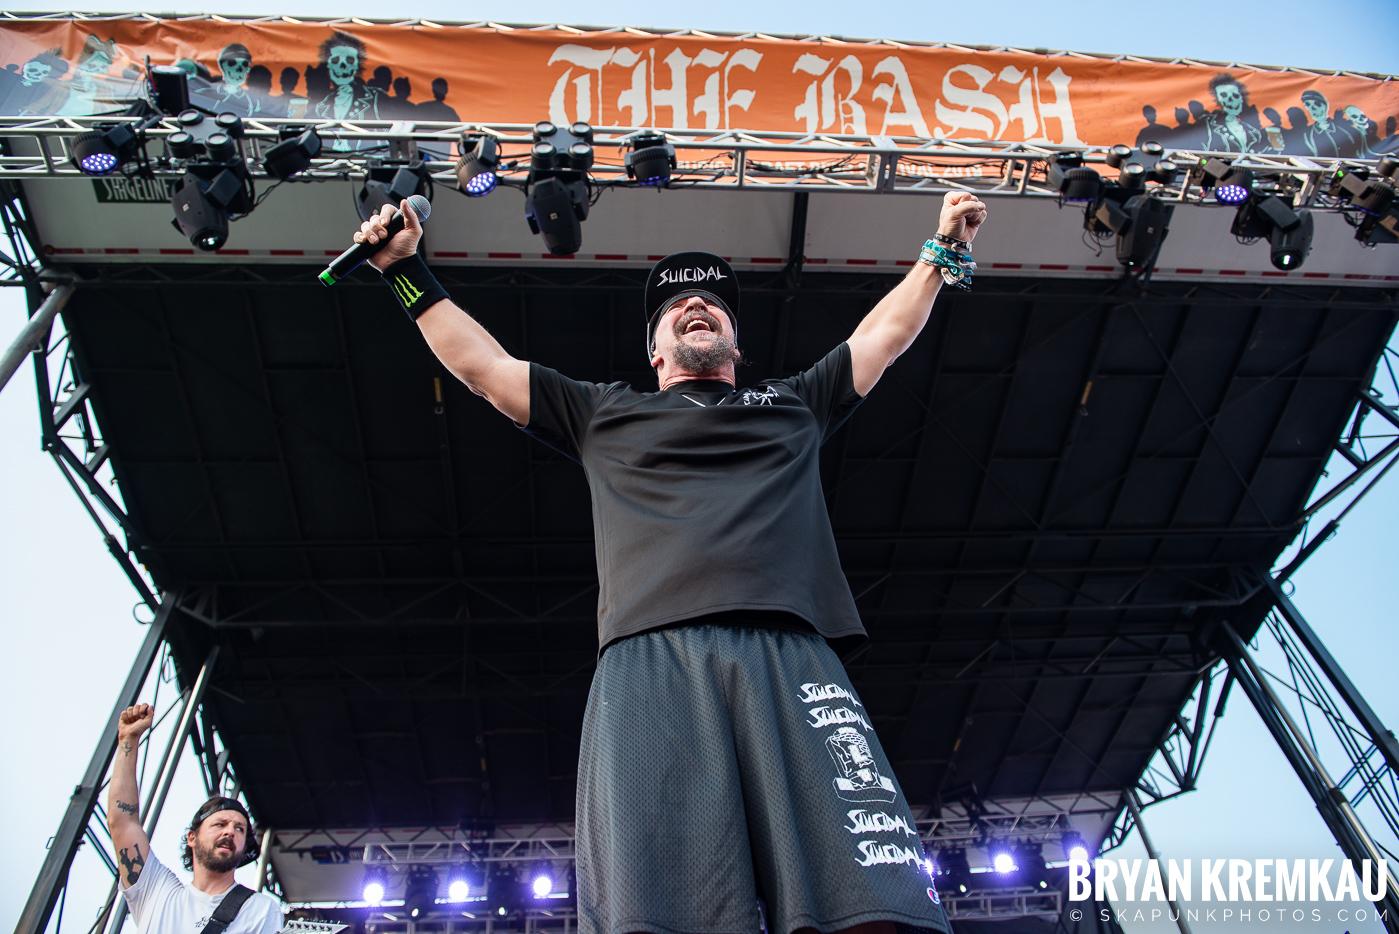 Suicidal Tendencies @ The Bash Music & Craft Beer Festival, Old Bridge Township Raceway Park, Englishtown, NJ - 6.2.19 (11)